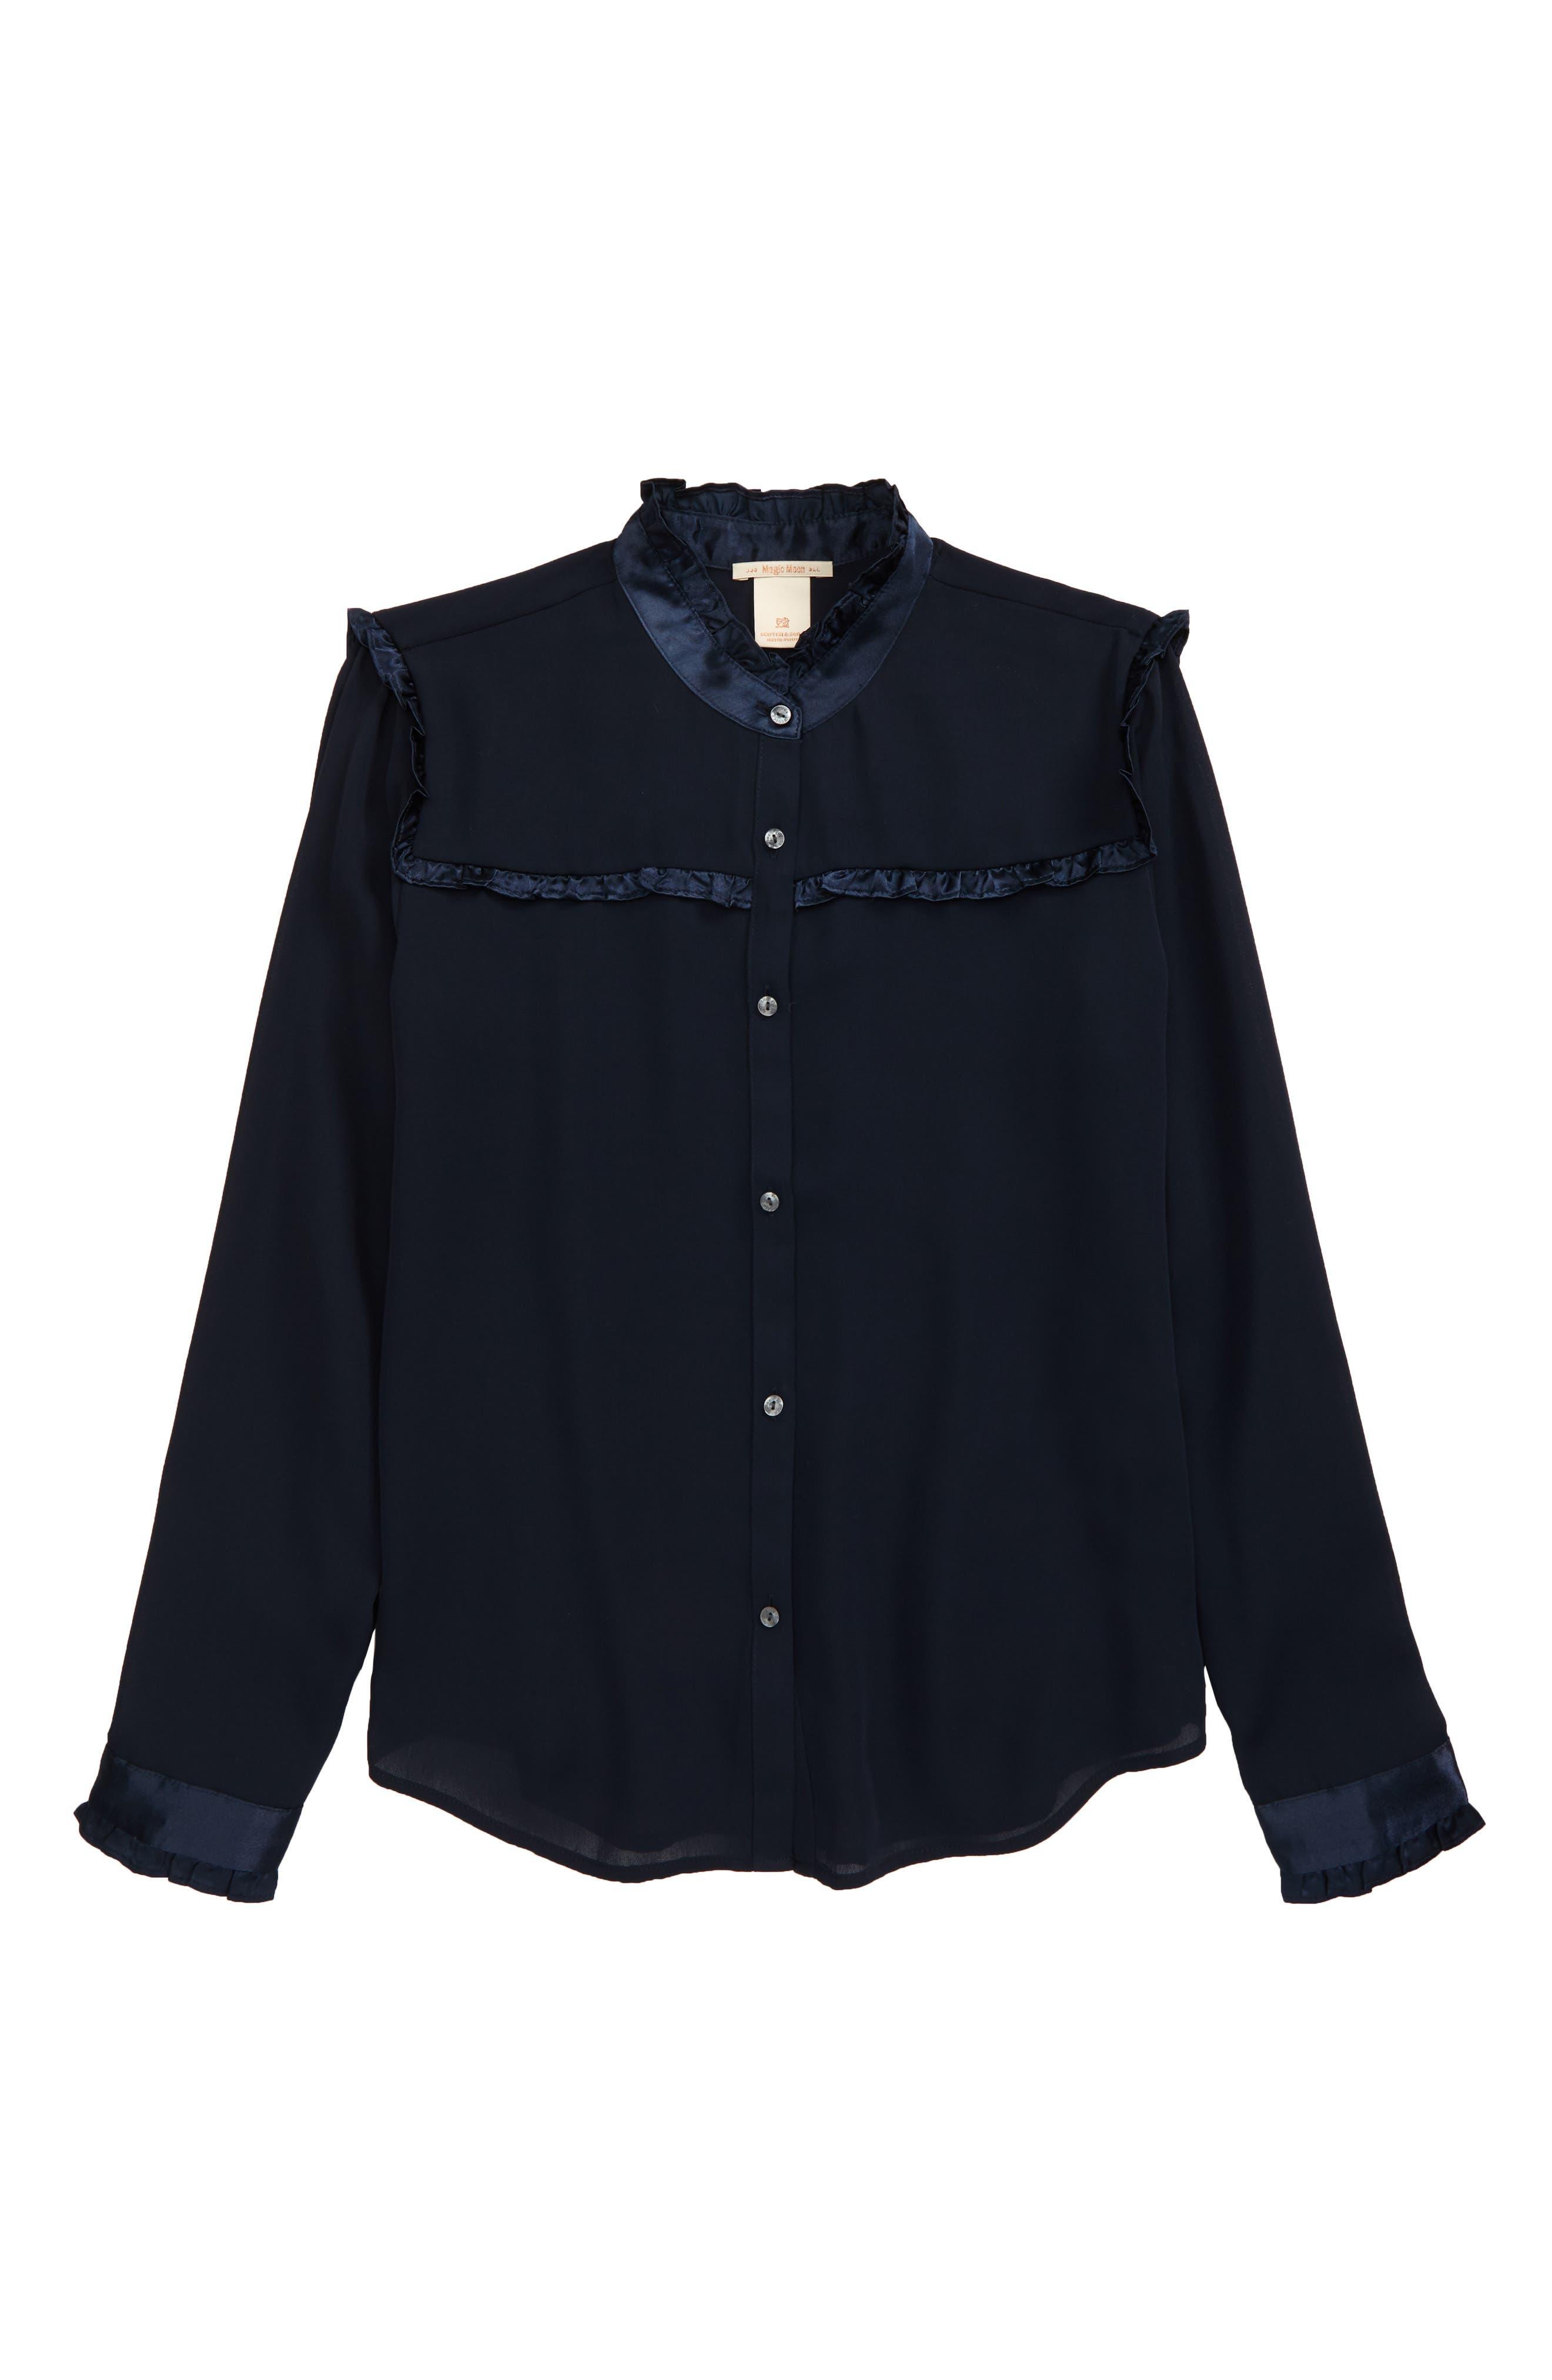 Image of Scotch R'Belle Kids' Ruffle Button-Up Shirt